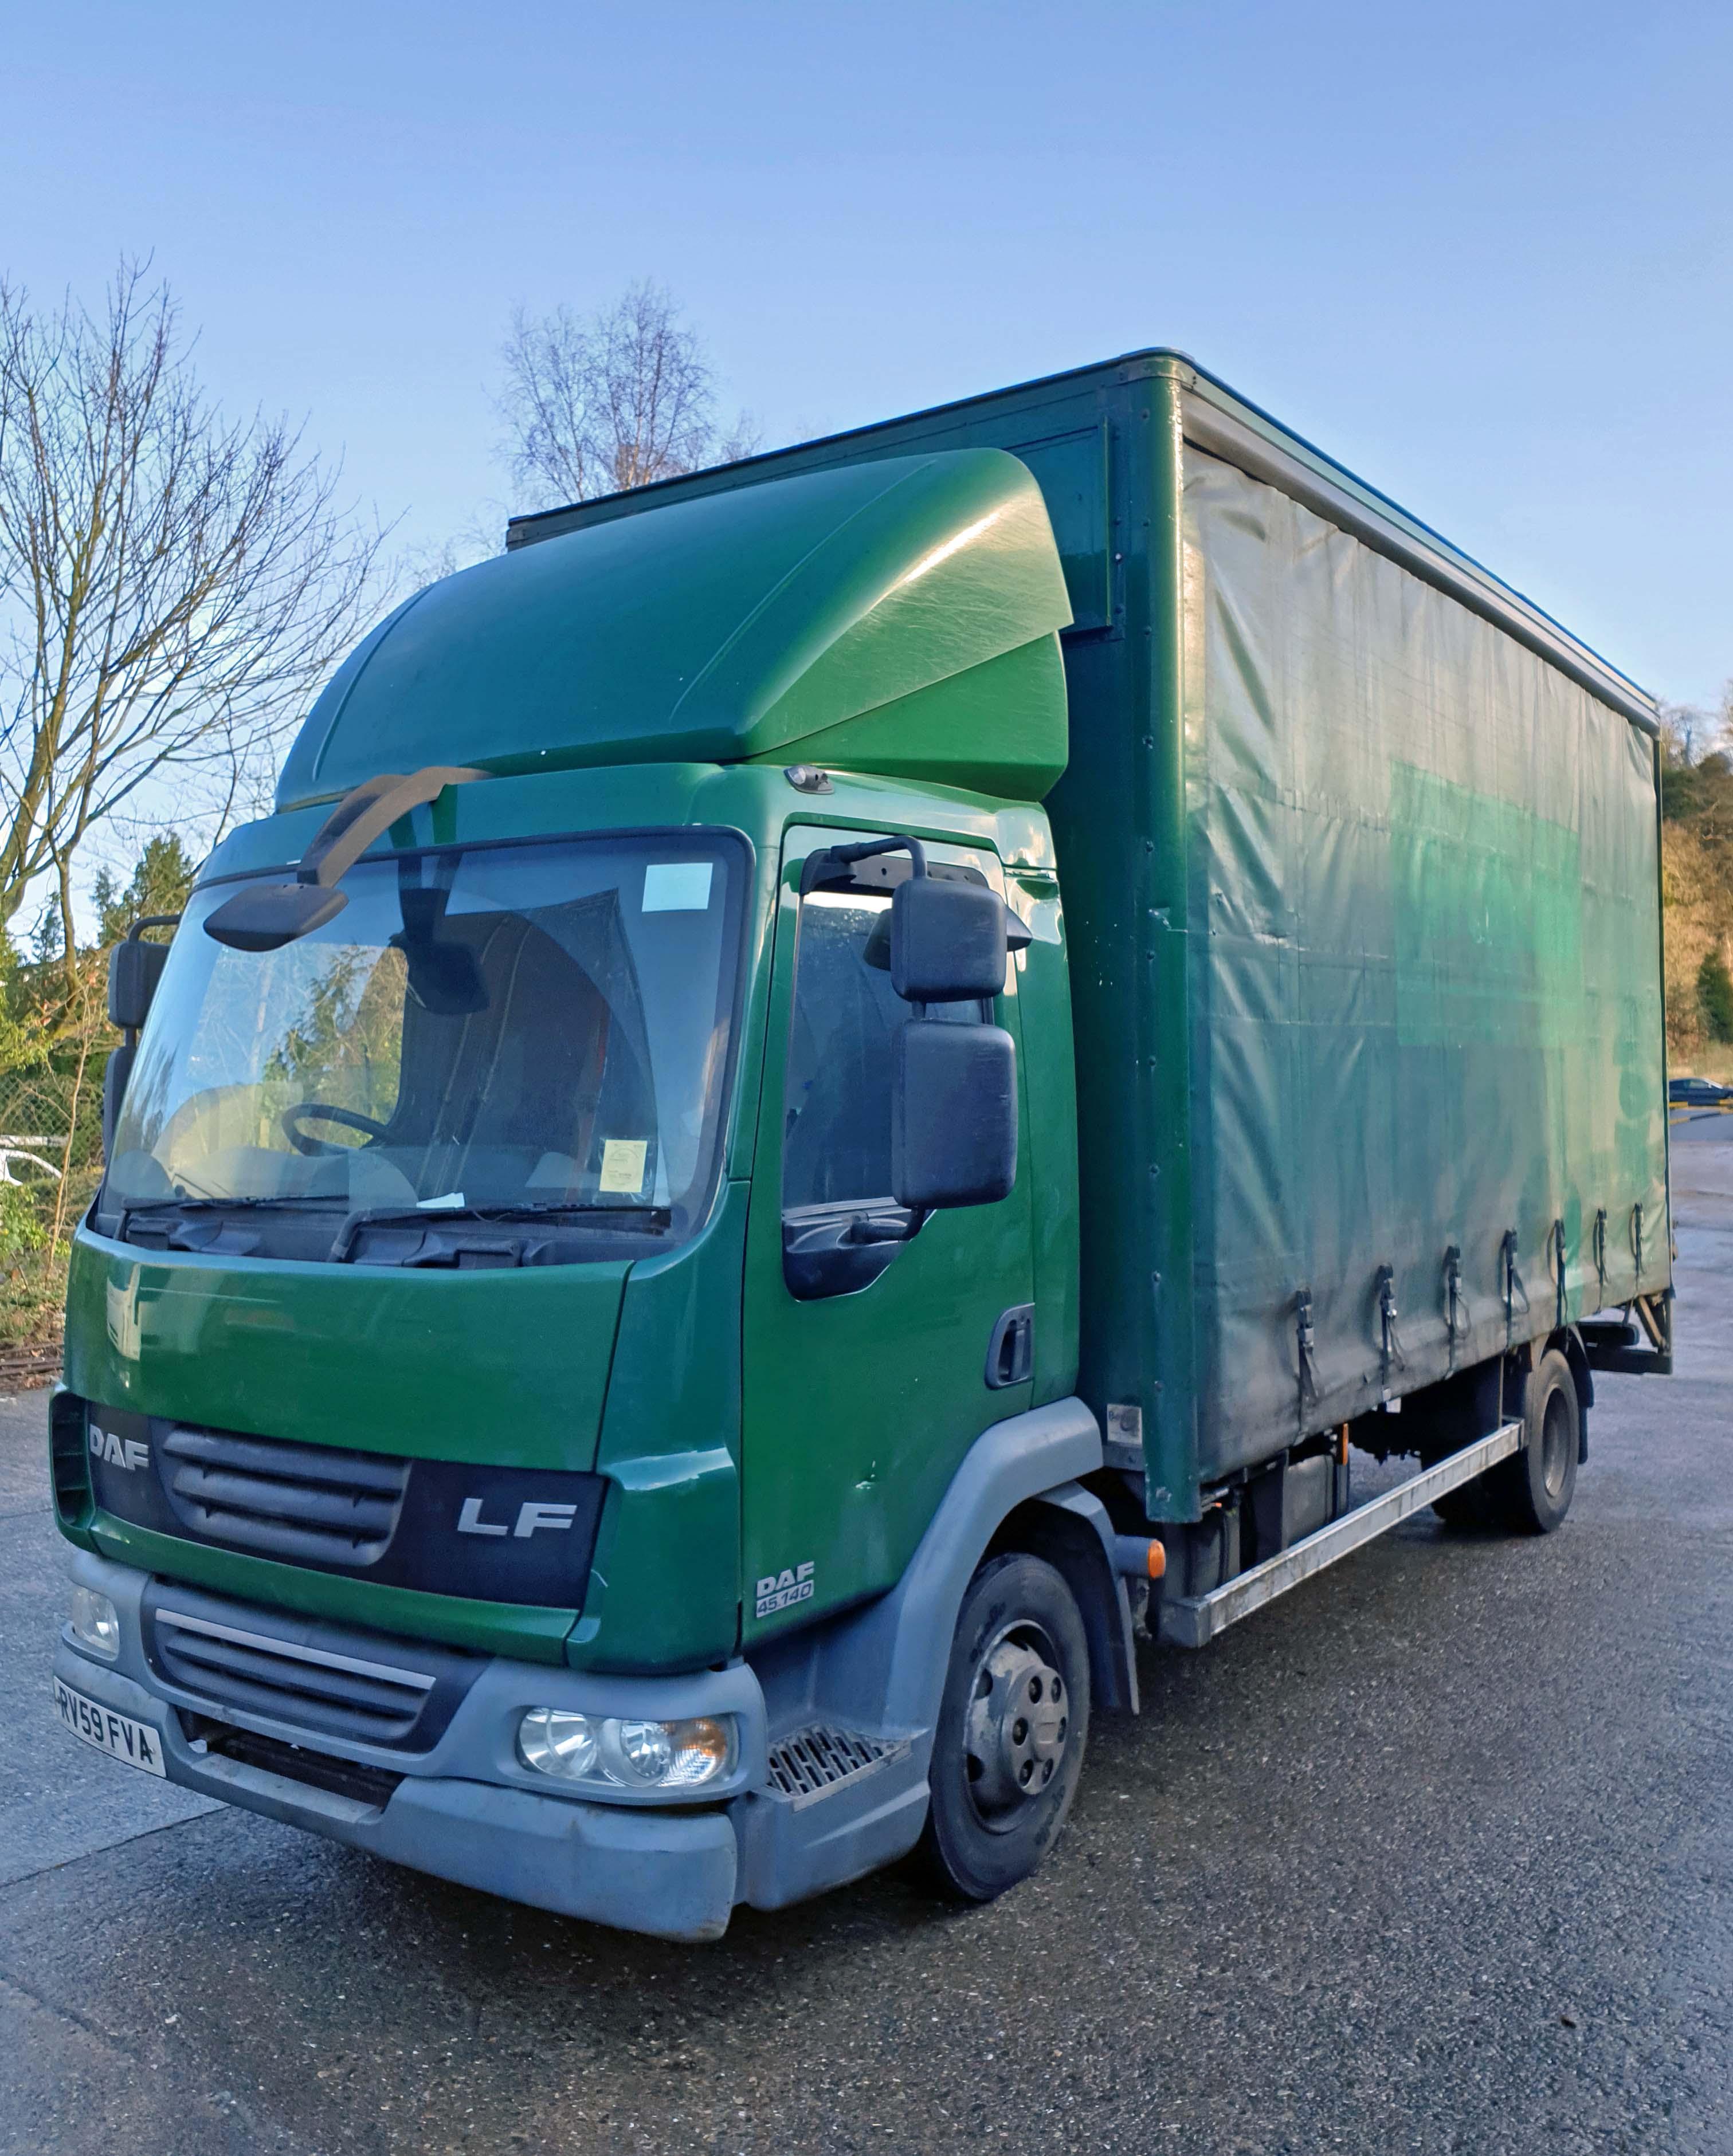 A DAF FA LF45.140 08 E 4461CC Euro4 4x2 7.5-Tonne Curtainside Truck, Registration No. RV59 FVA,